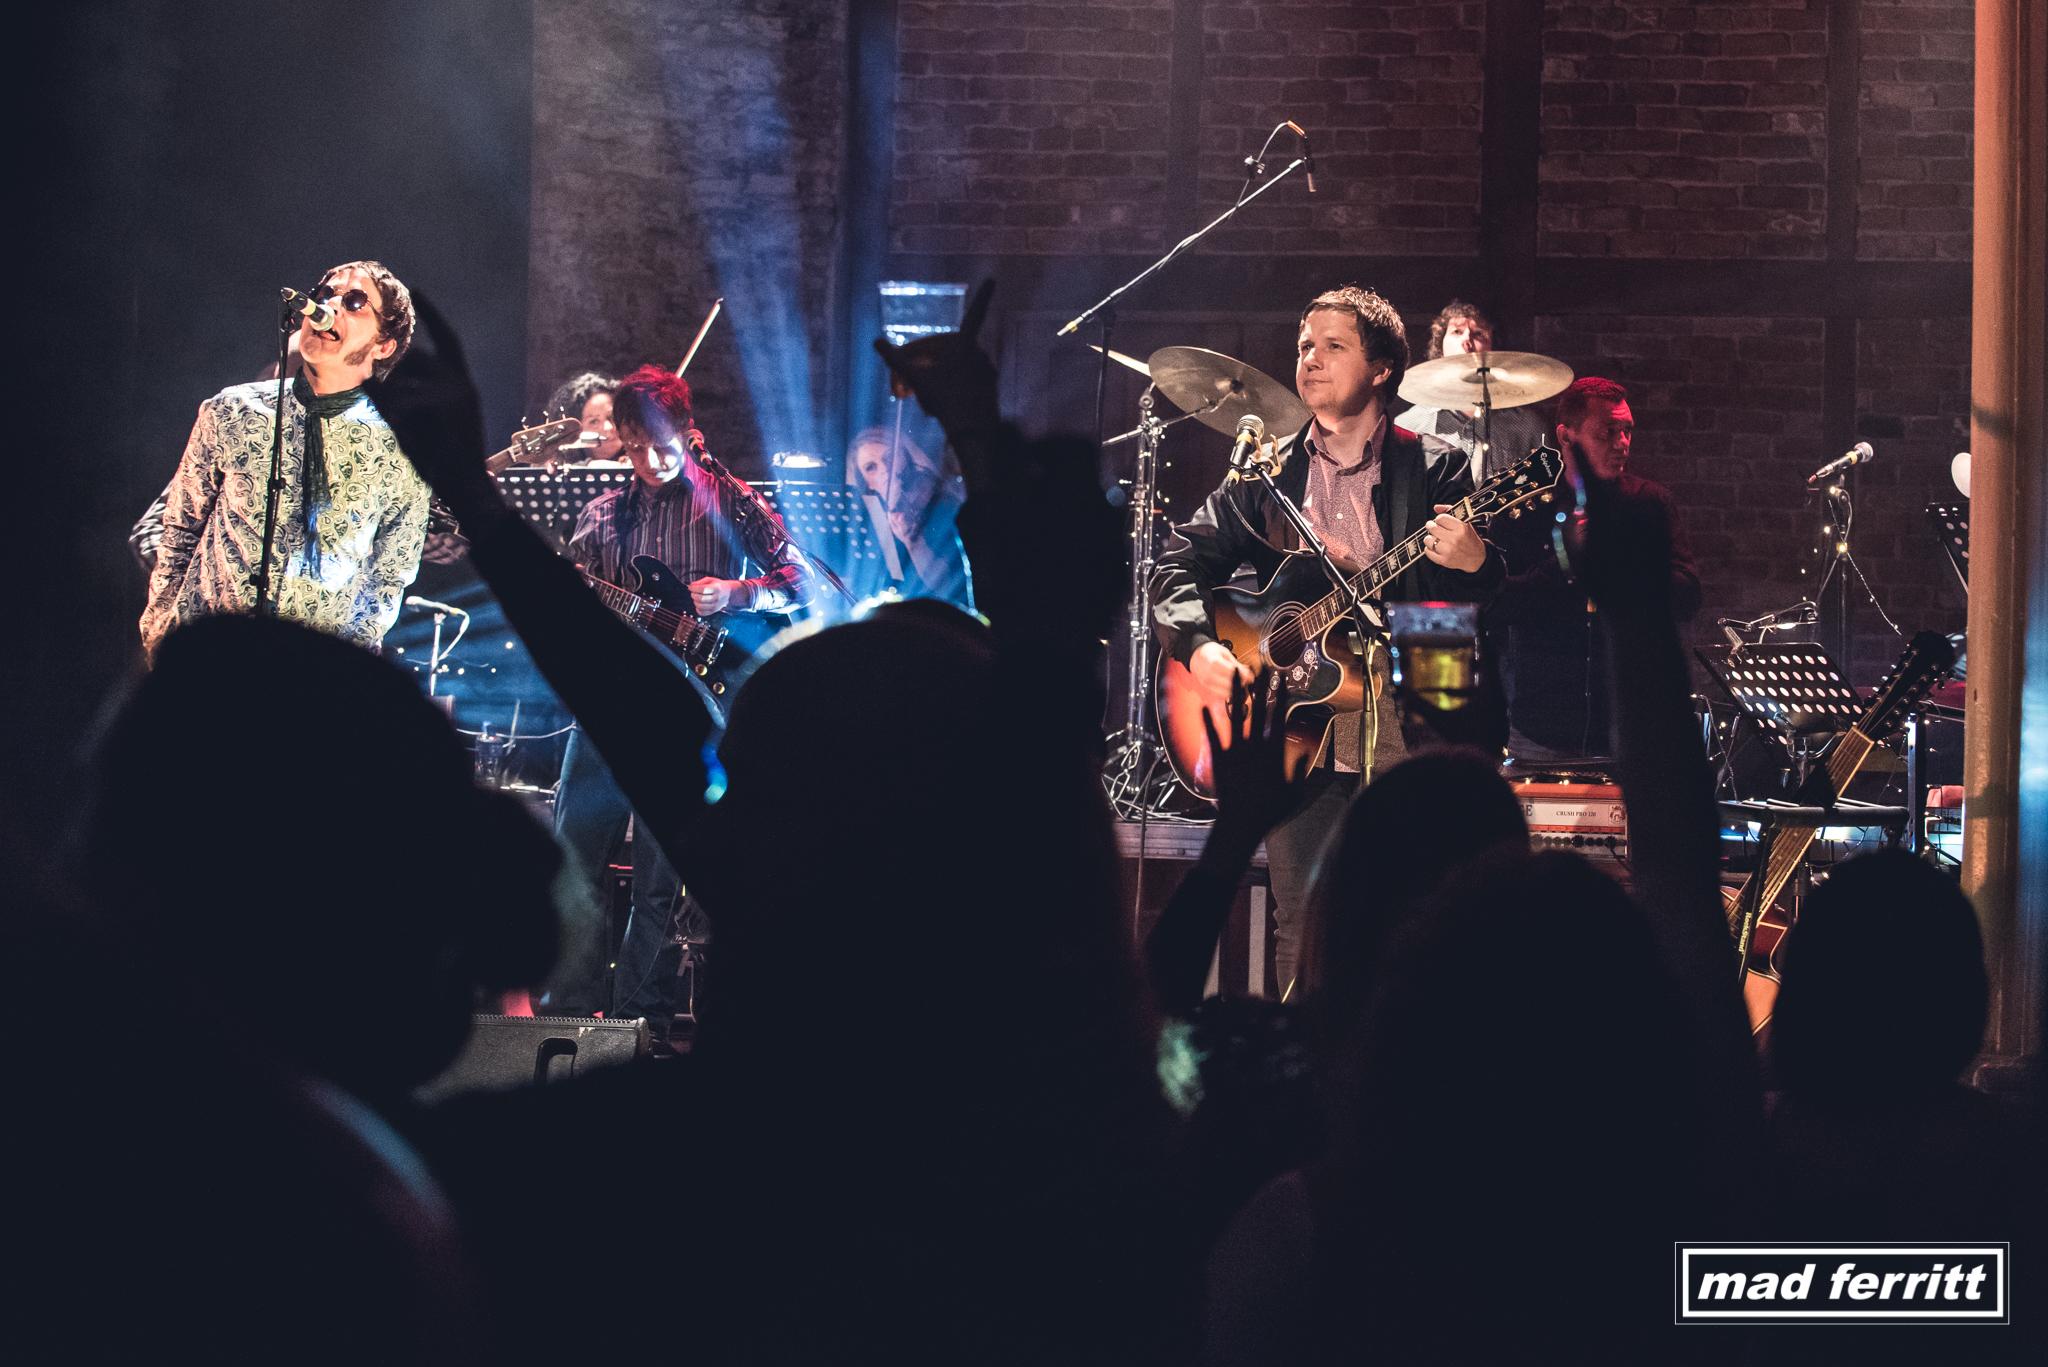 Mad Ferritt presents Oasis MTV Unplugged